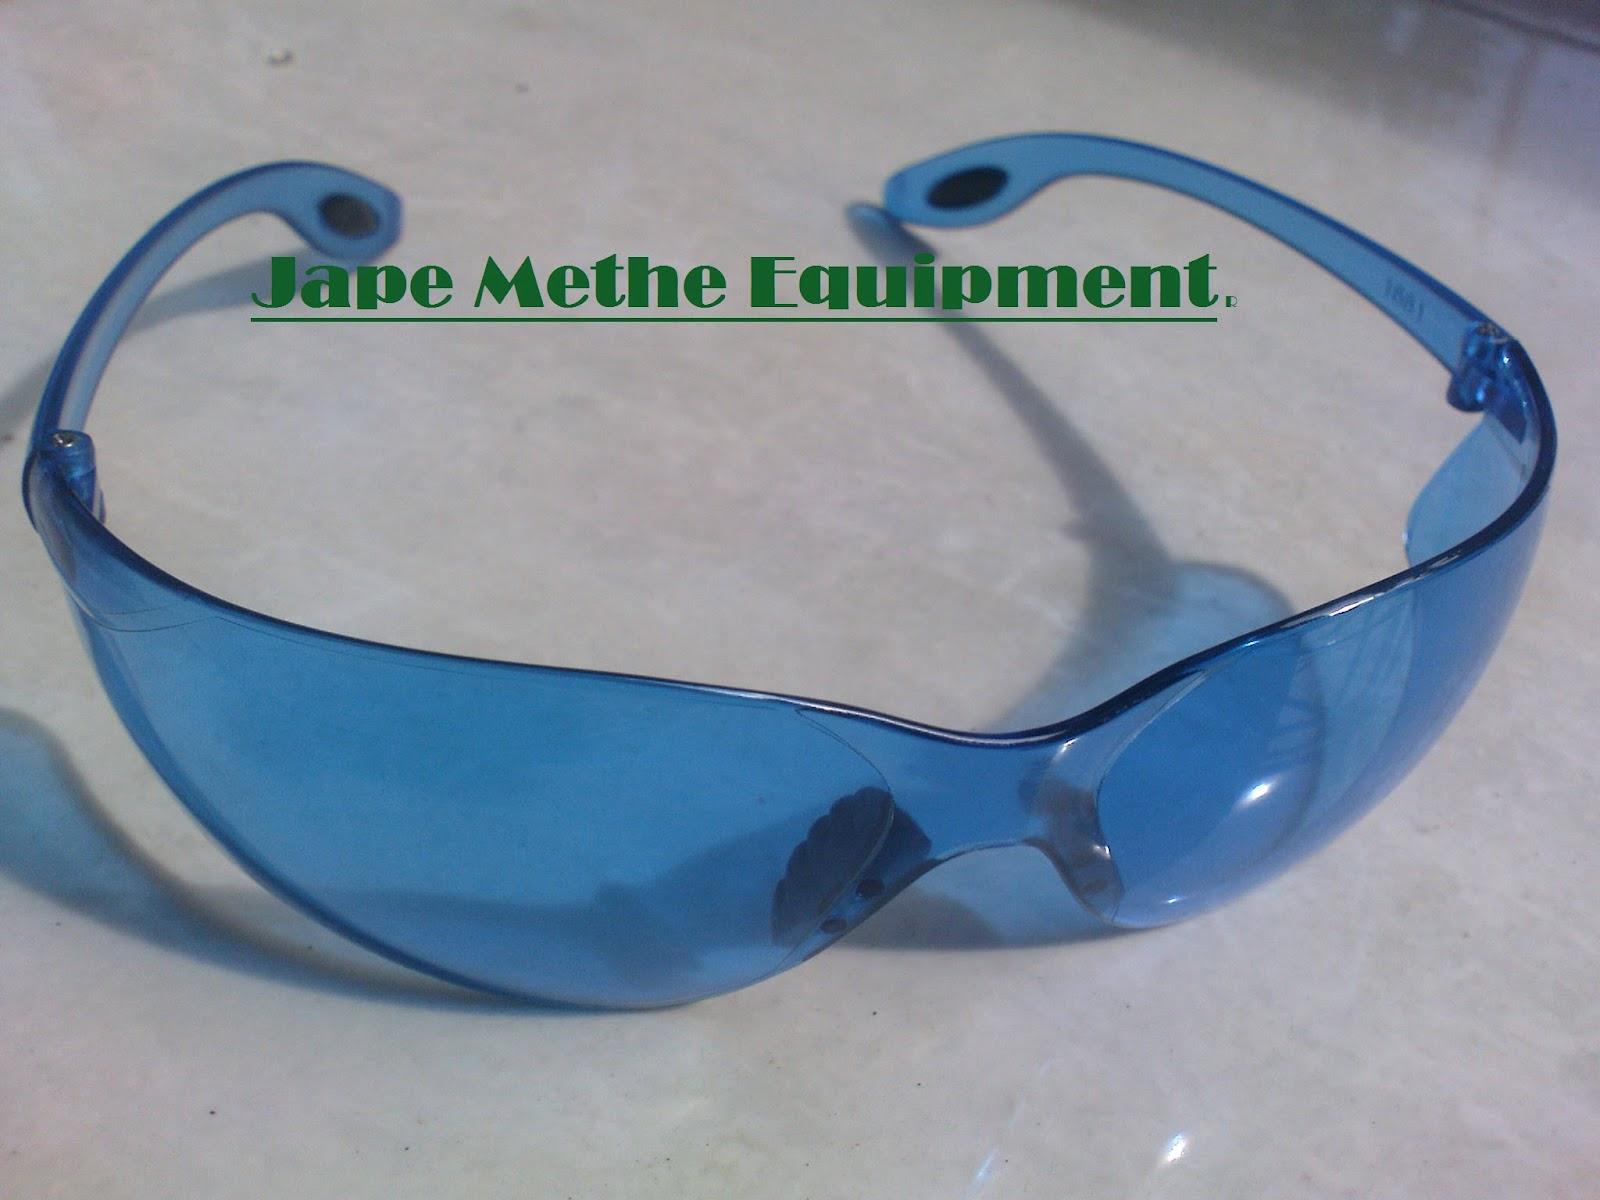 Jape Methe Equipment b366c4e84c